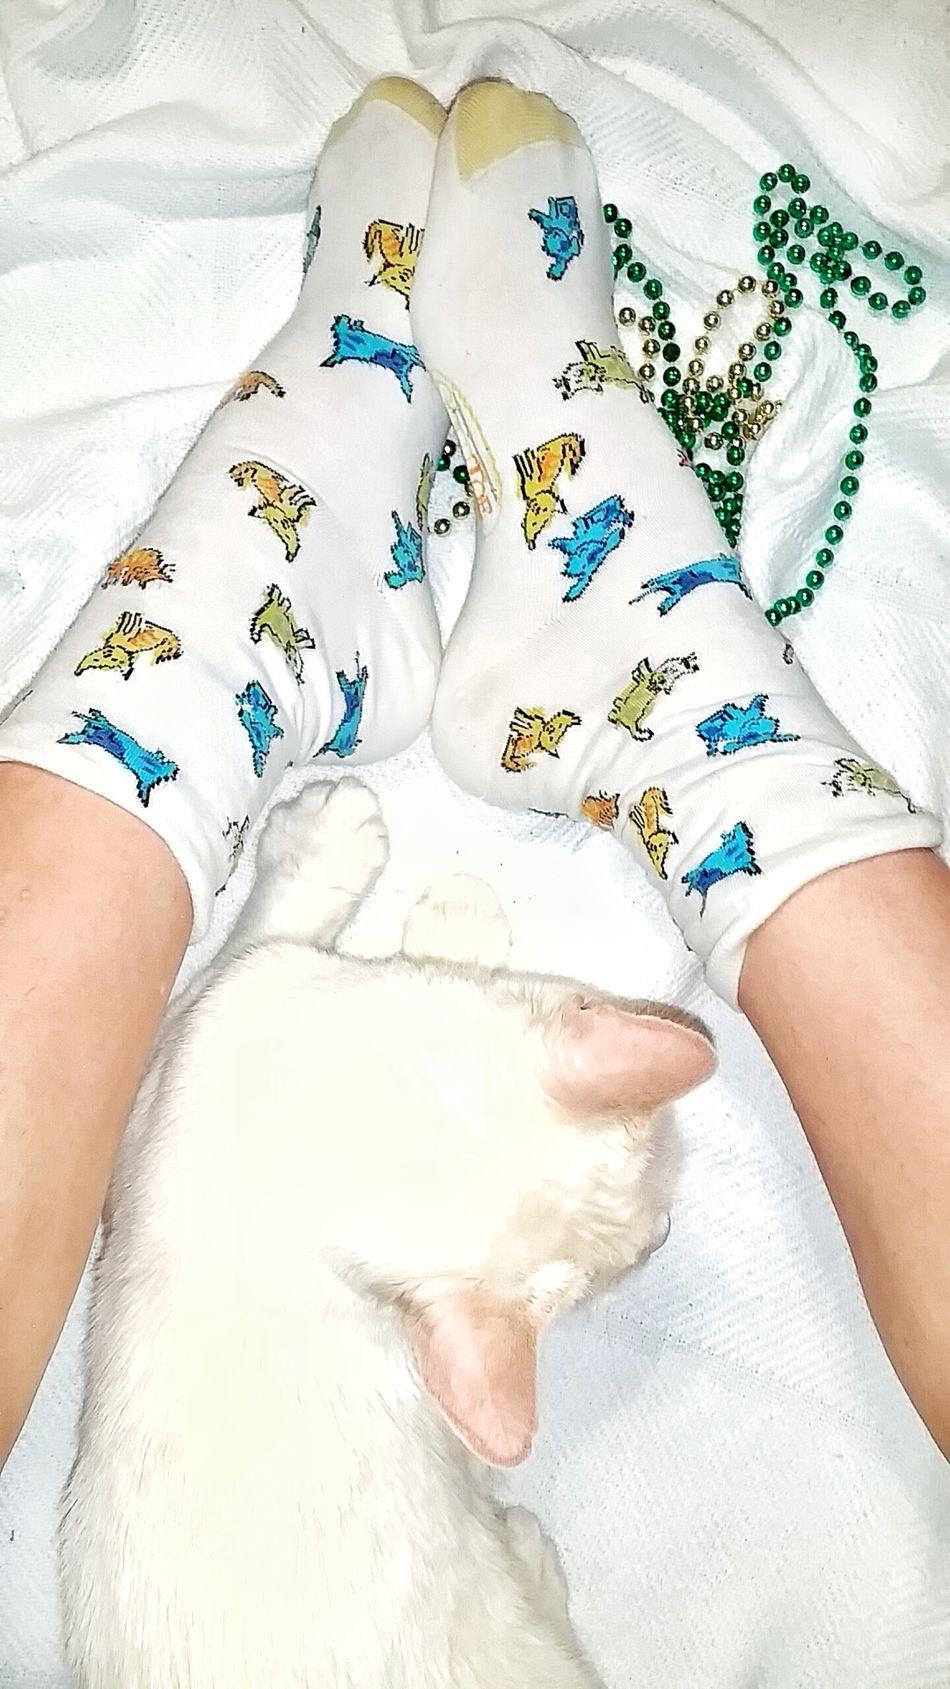 TK Maxx Socksie Pets One Animal Foot Multicolors  Cat Lovers Animal Colorful Socks Cat Cozy Comfortable Softness Cute Socks Clothing Socks Funny Socks Cat Socks Texture Funny Cat Lazy Cat Colorful Design Close-up Bright Colors Multi Colored